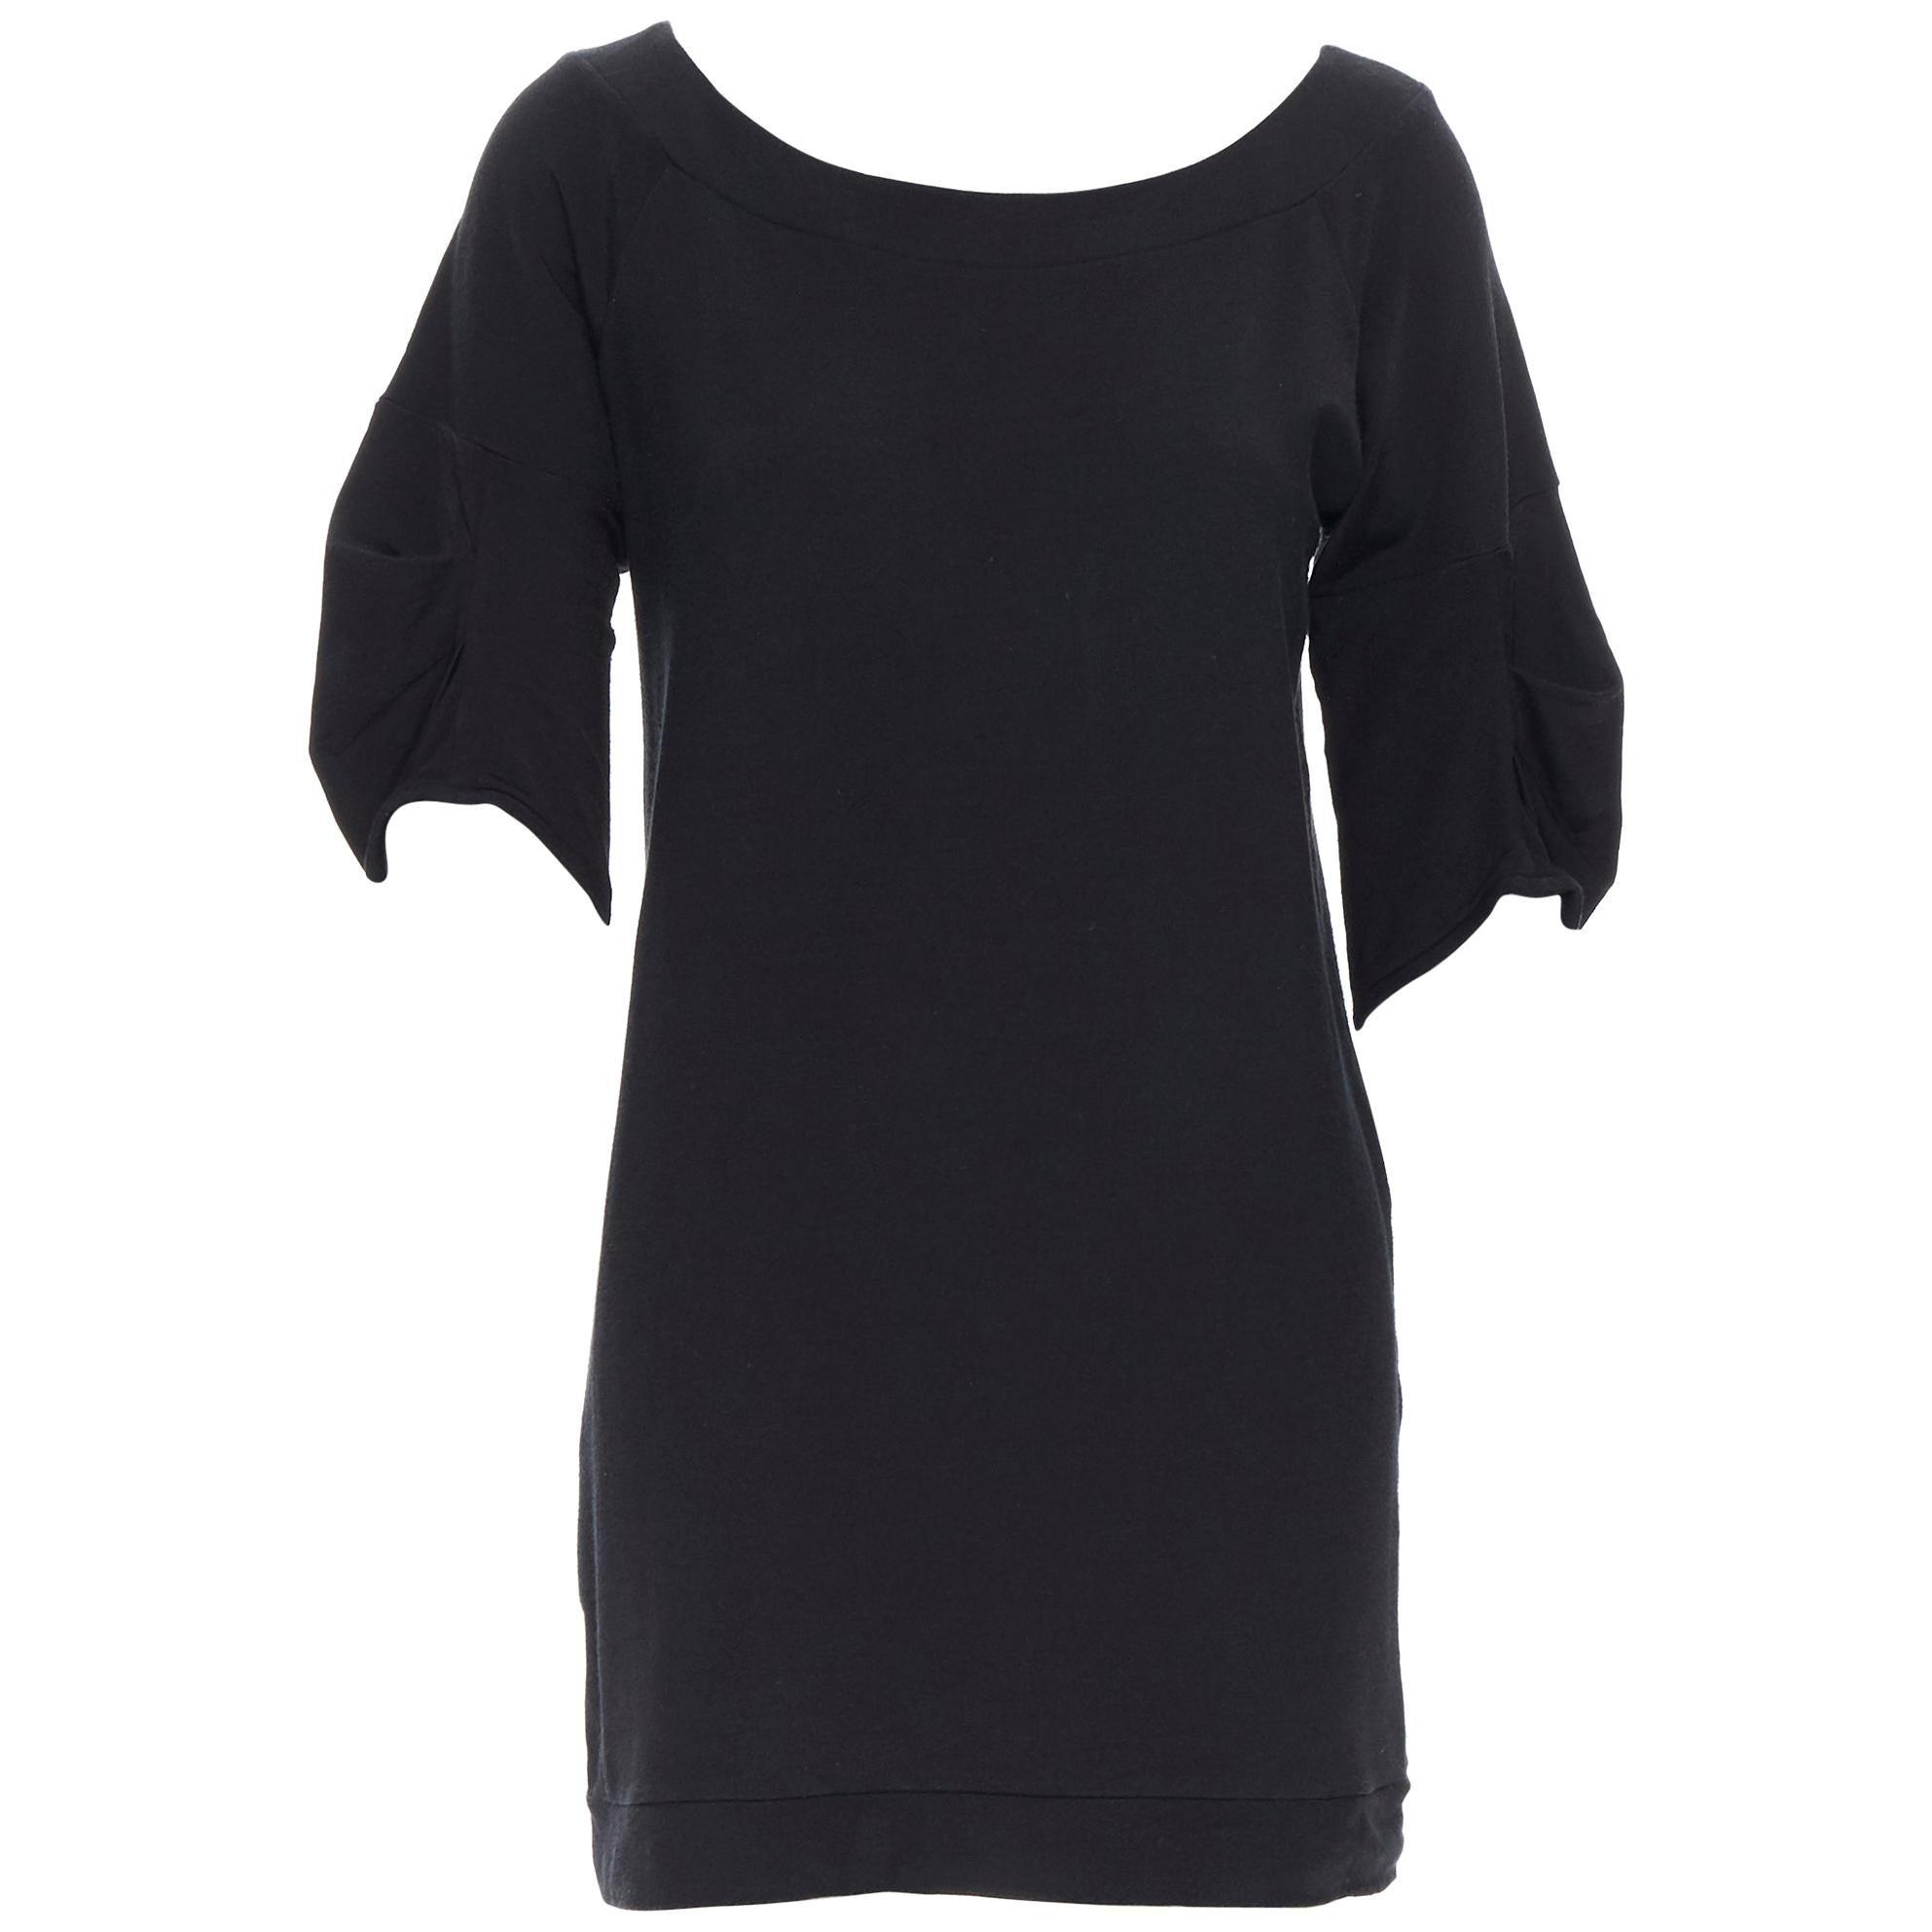 vintage MIU MIU black cotton round neck rounded pleated short sleeve dress M